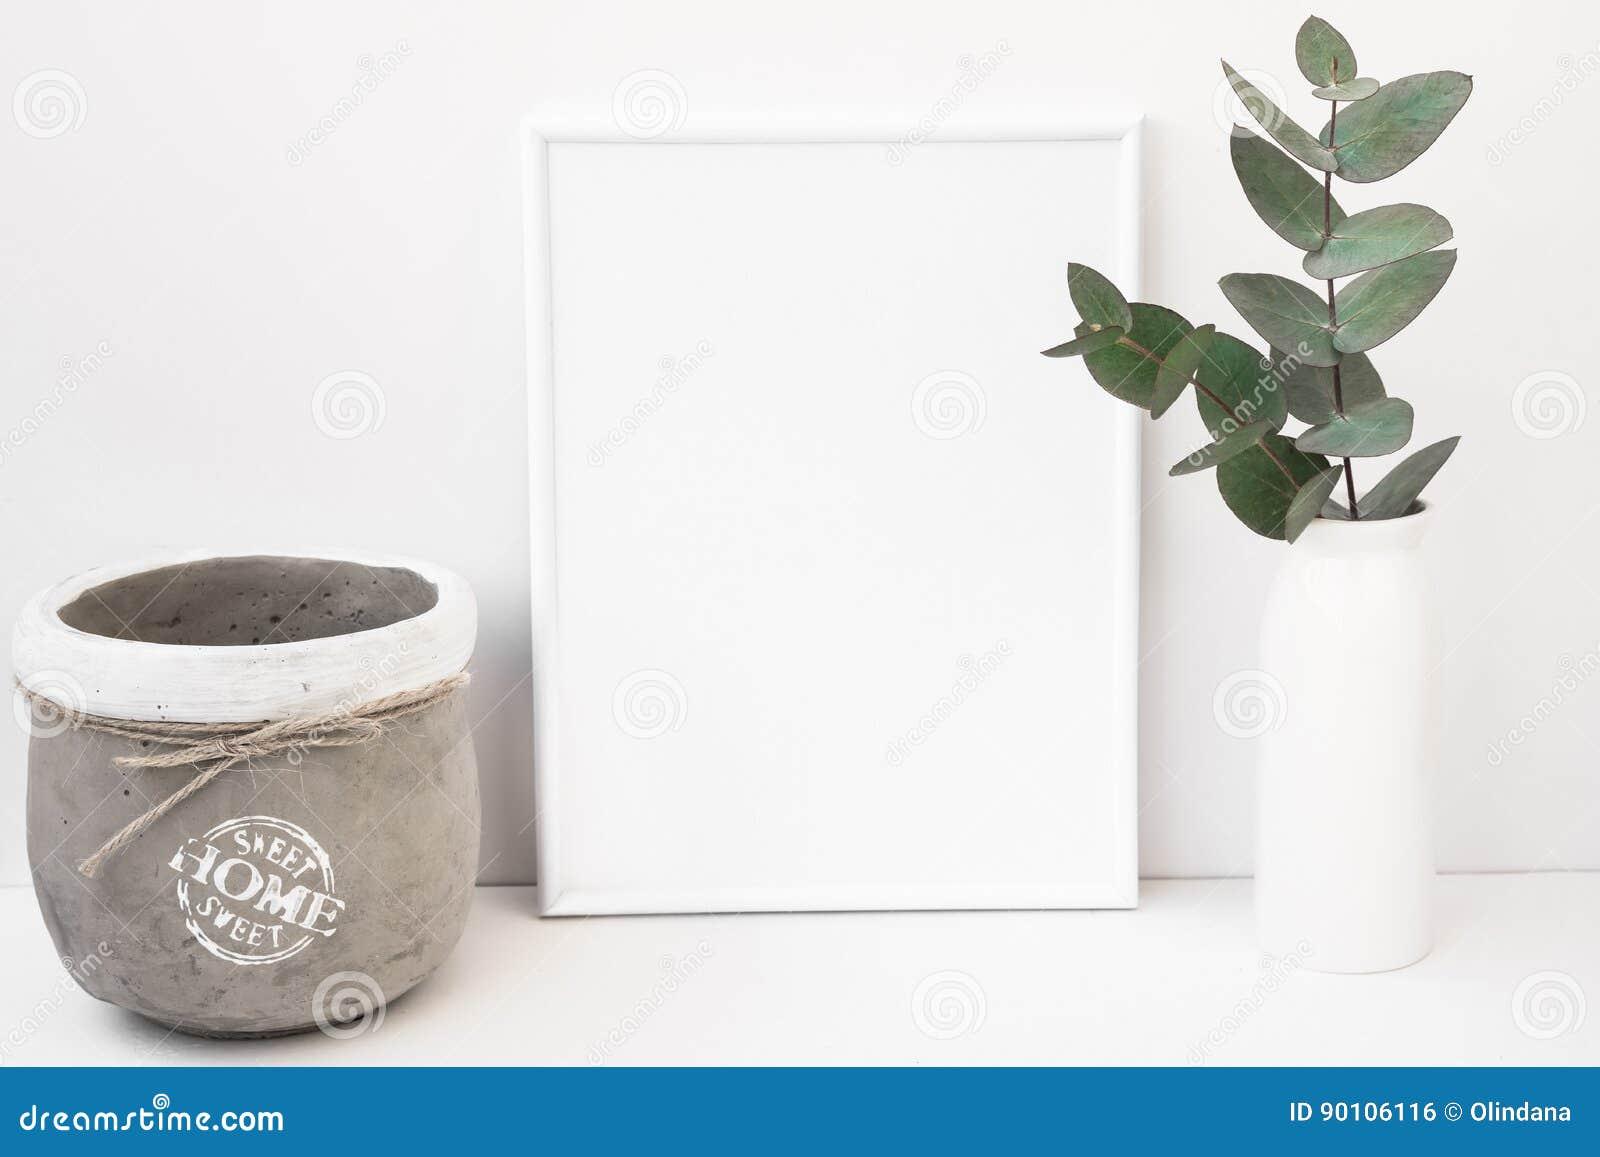 White background frame mockup, green eucalyptus in ceramic vase, cement pot, styled image